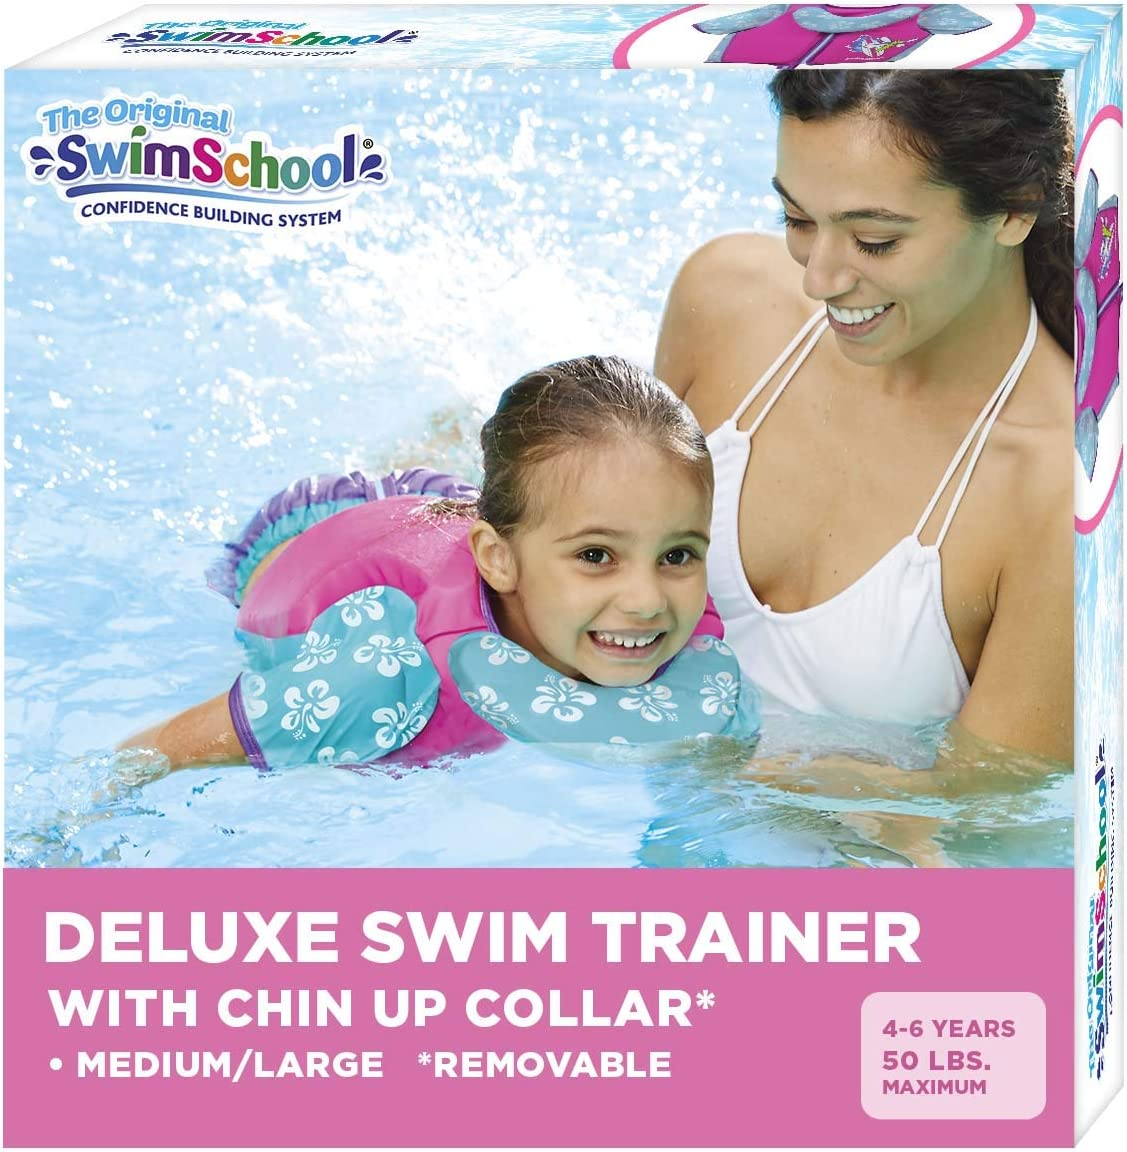 Swim Trainer Vest with UPF50 Shoulder Sleeves, Stretchable Fabric, Flex-Form Design, Adjustable Safety Strap, Medium/Large, Up to 50 Lbs., Pink/Aqua